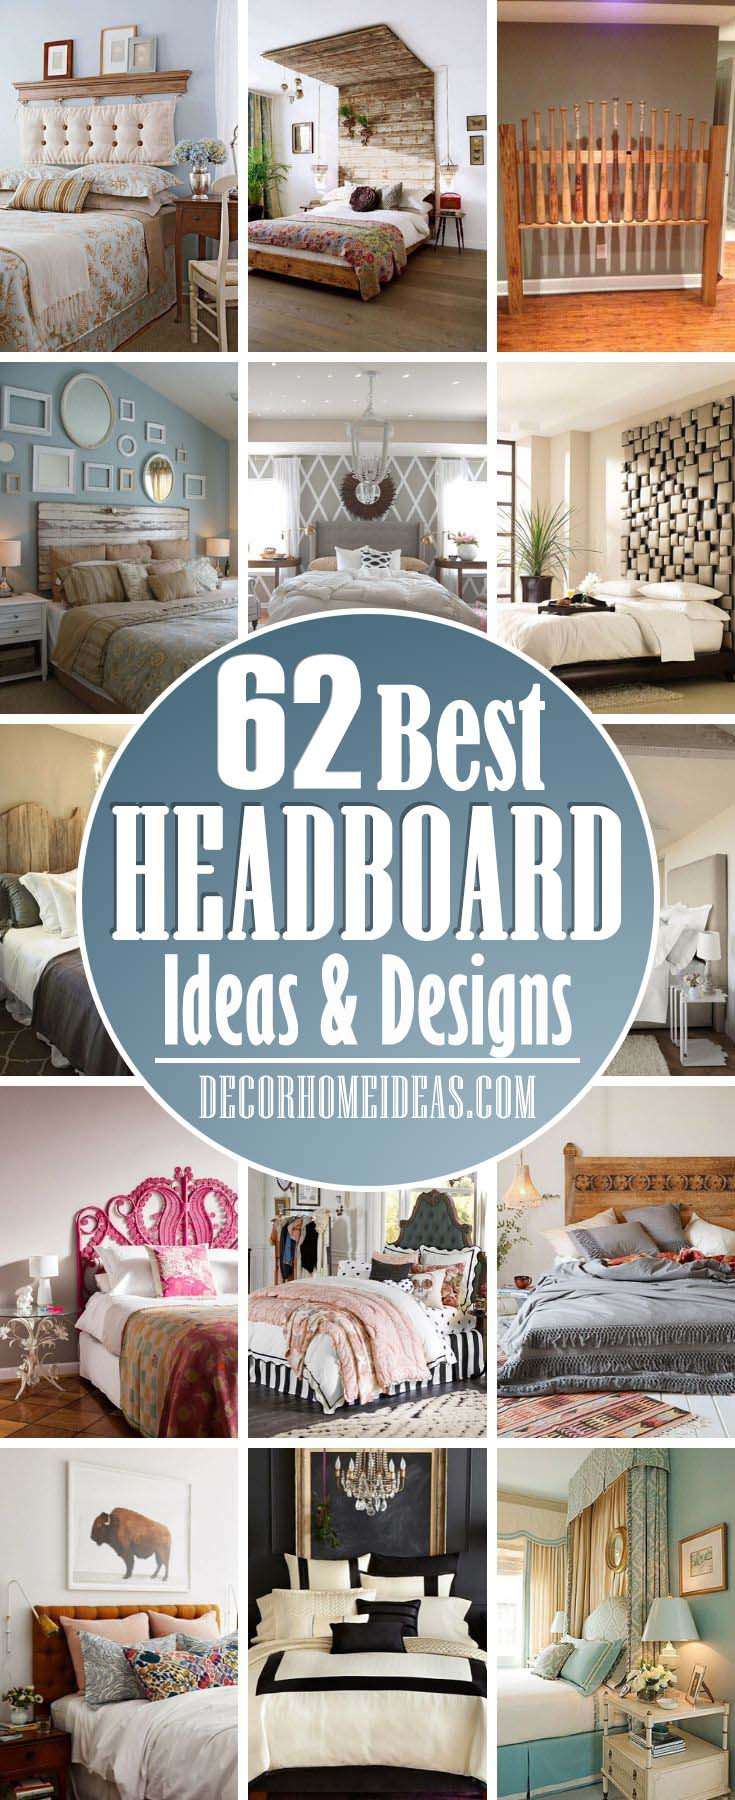 62 Amazing And Cool Headboard Ideas Decor Home Ideas